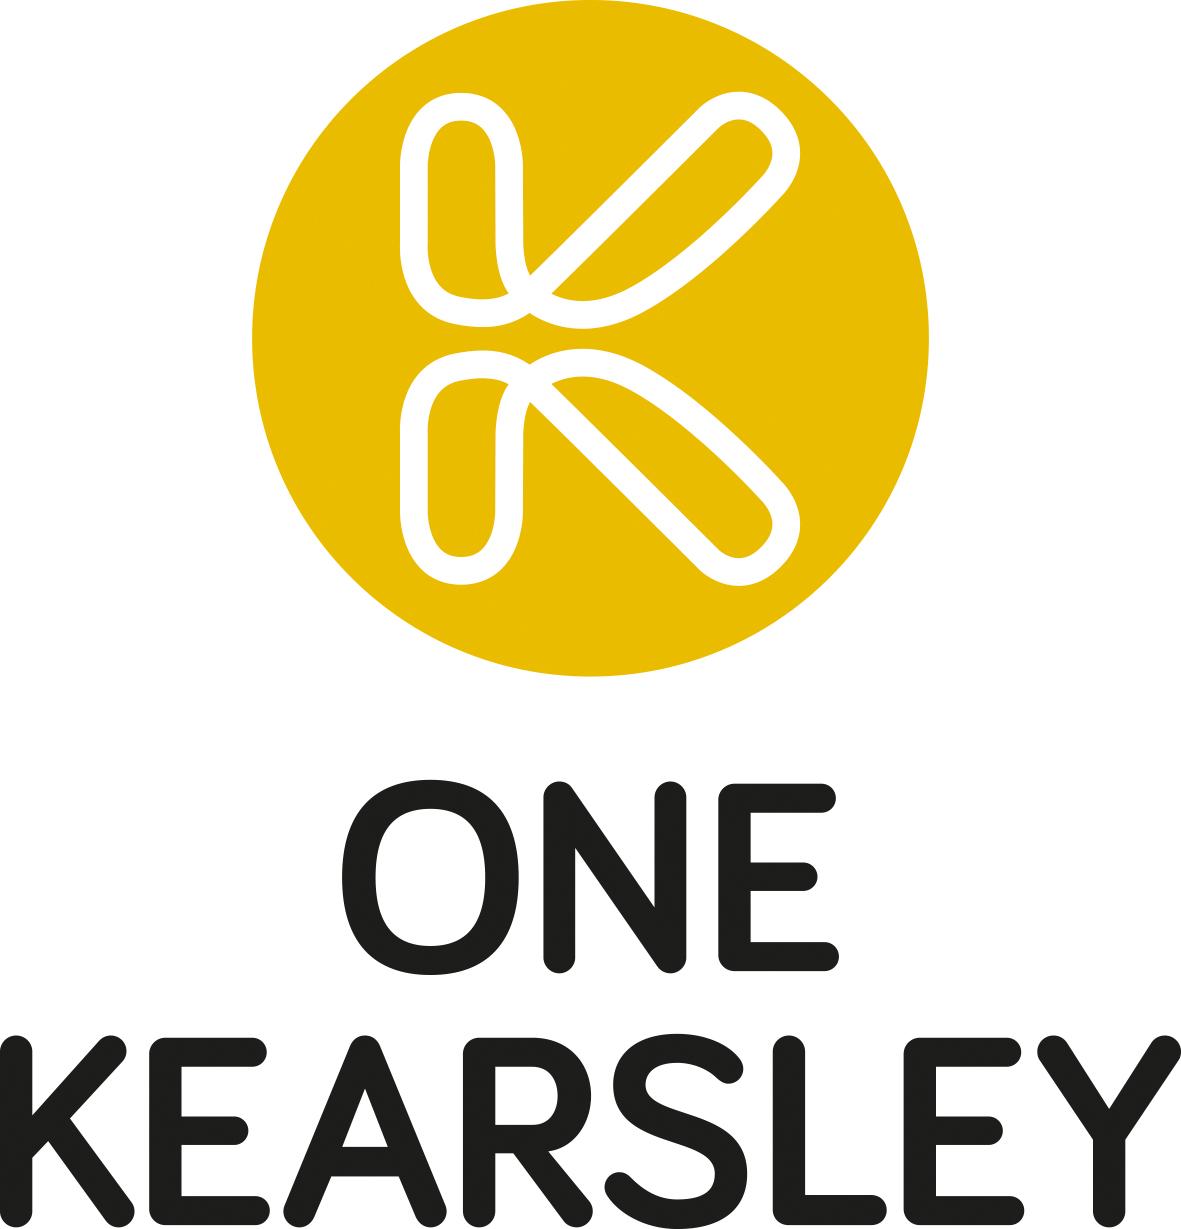 ONE KEARSLEY (logo)